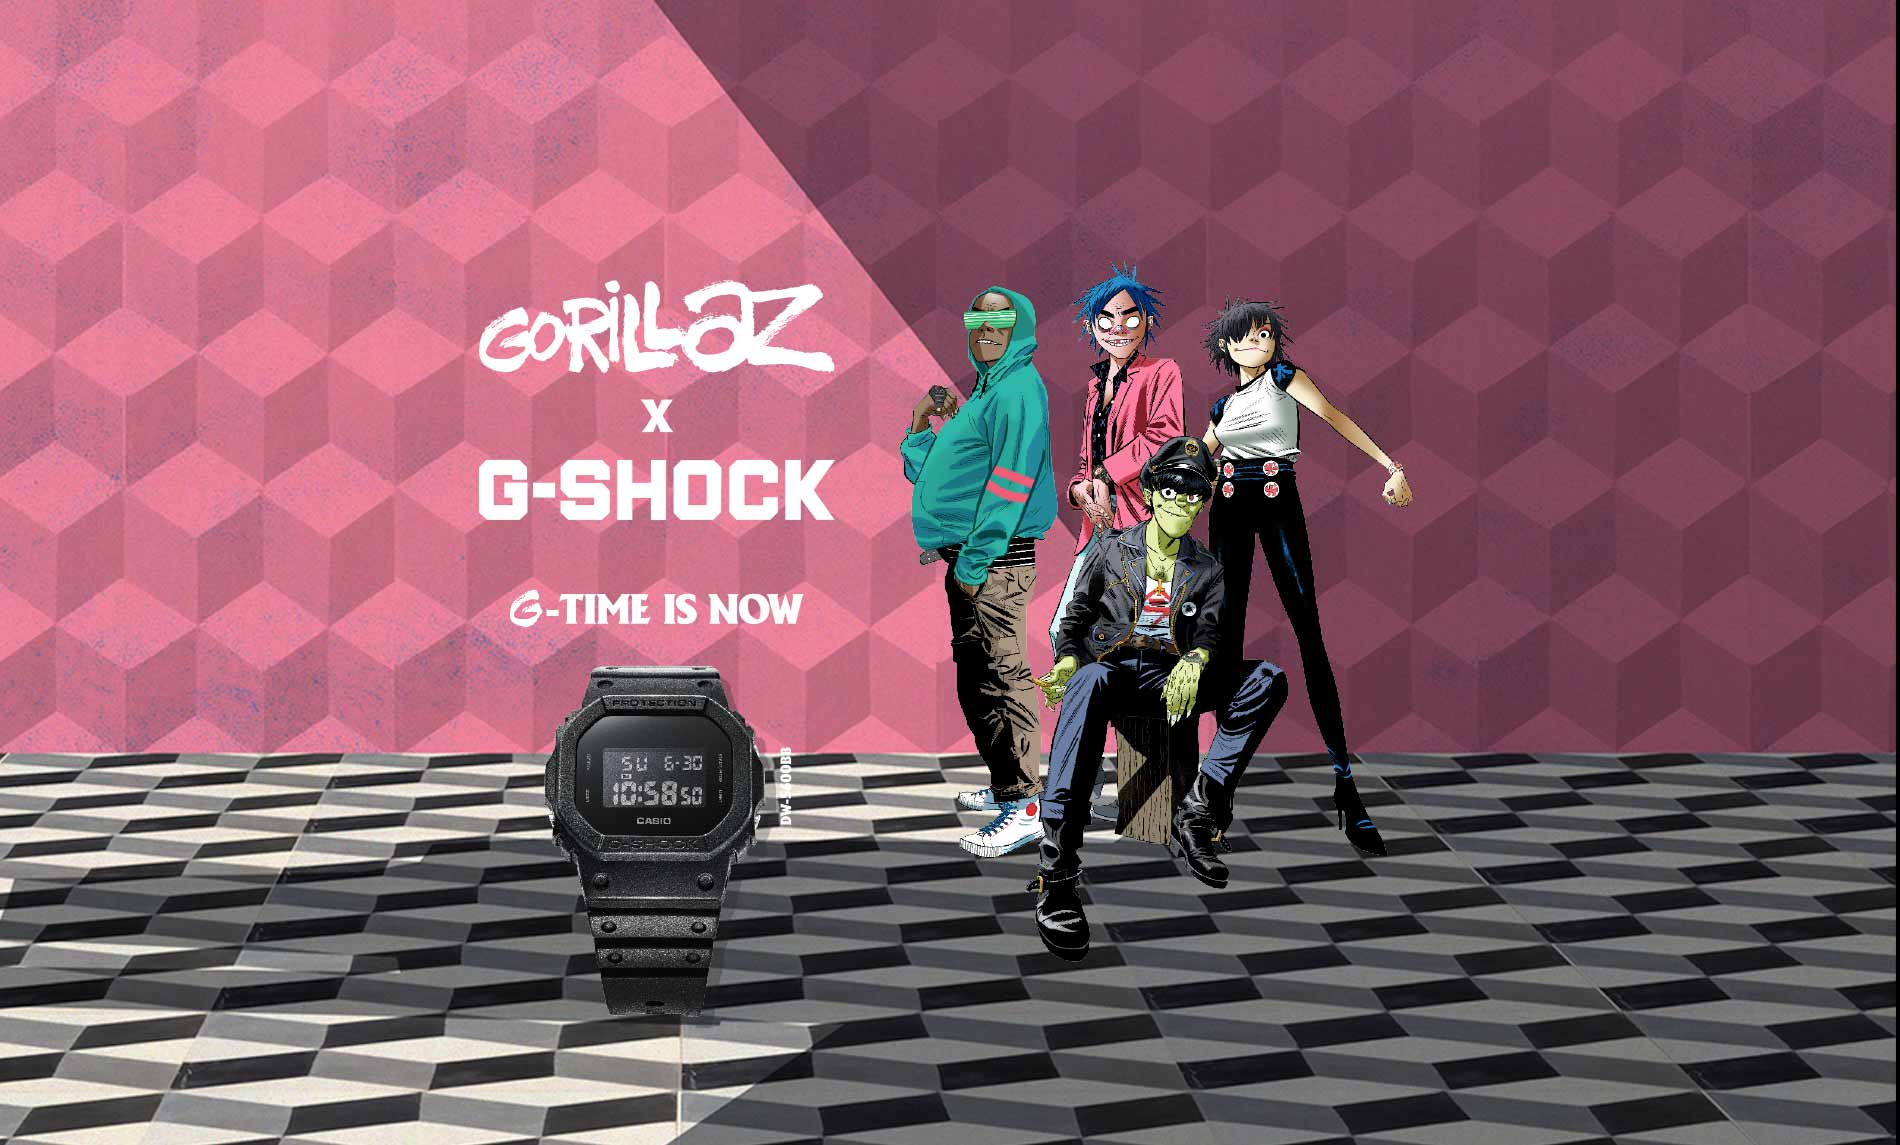 Gorillaz e G-SHOCK orologi